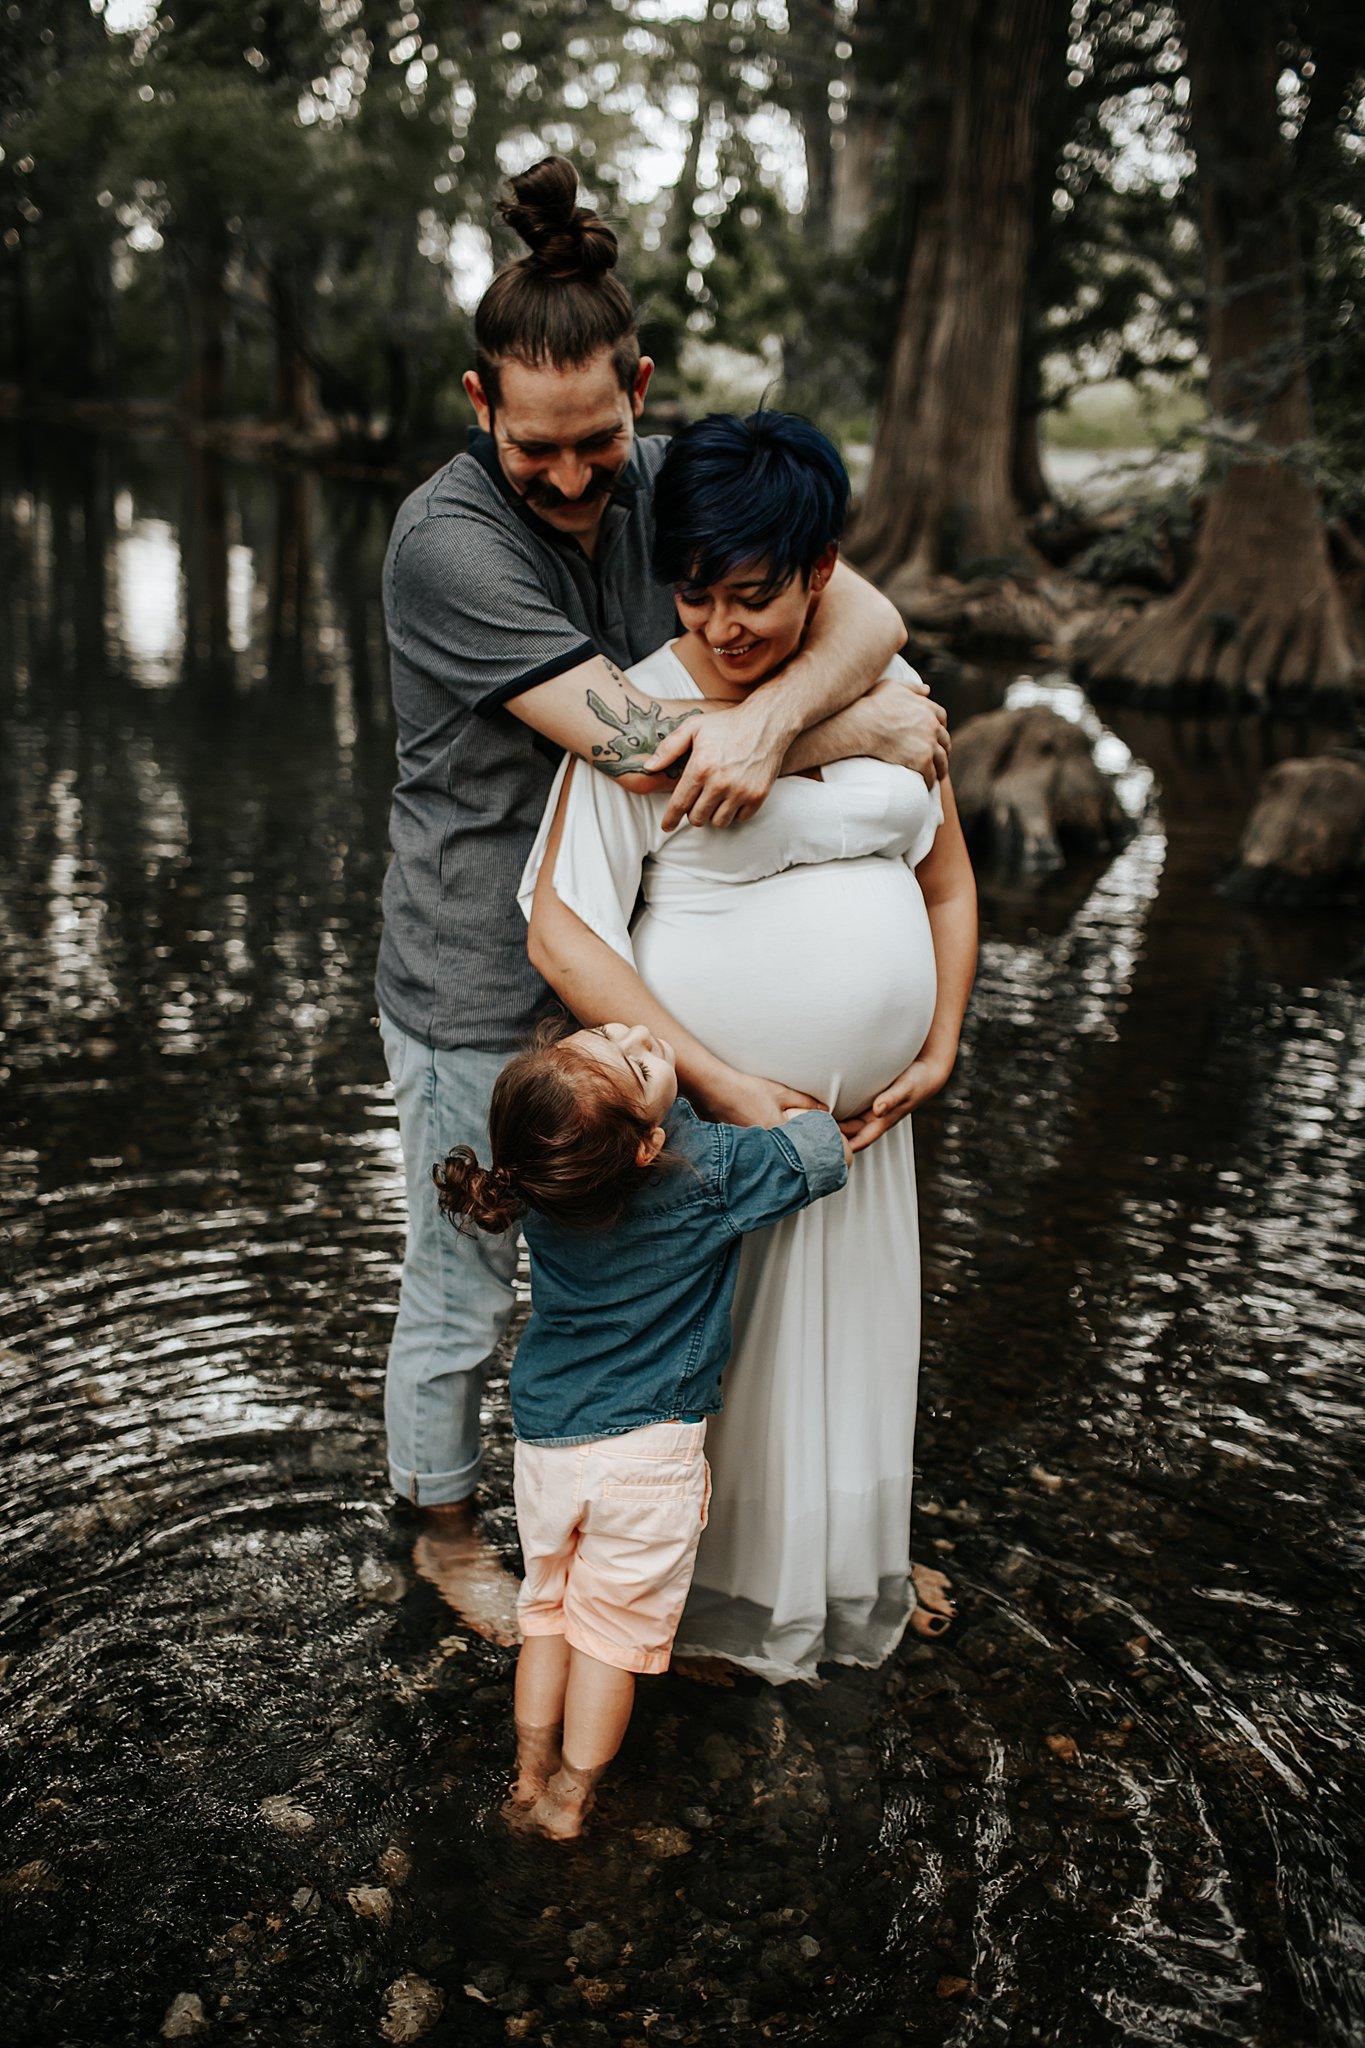 Meagan-San-Antonio-Maternity-Photographer-36_WEB.jpg